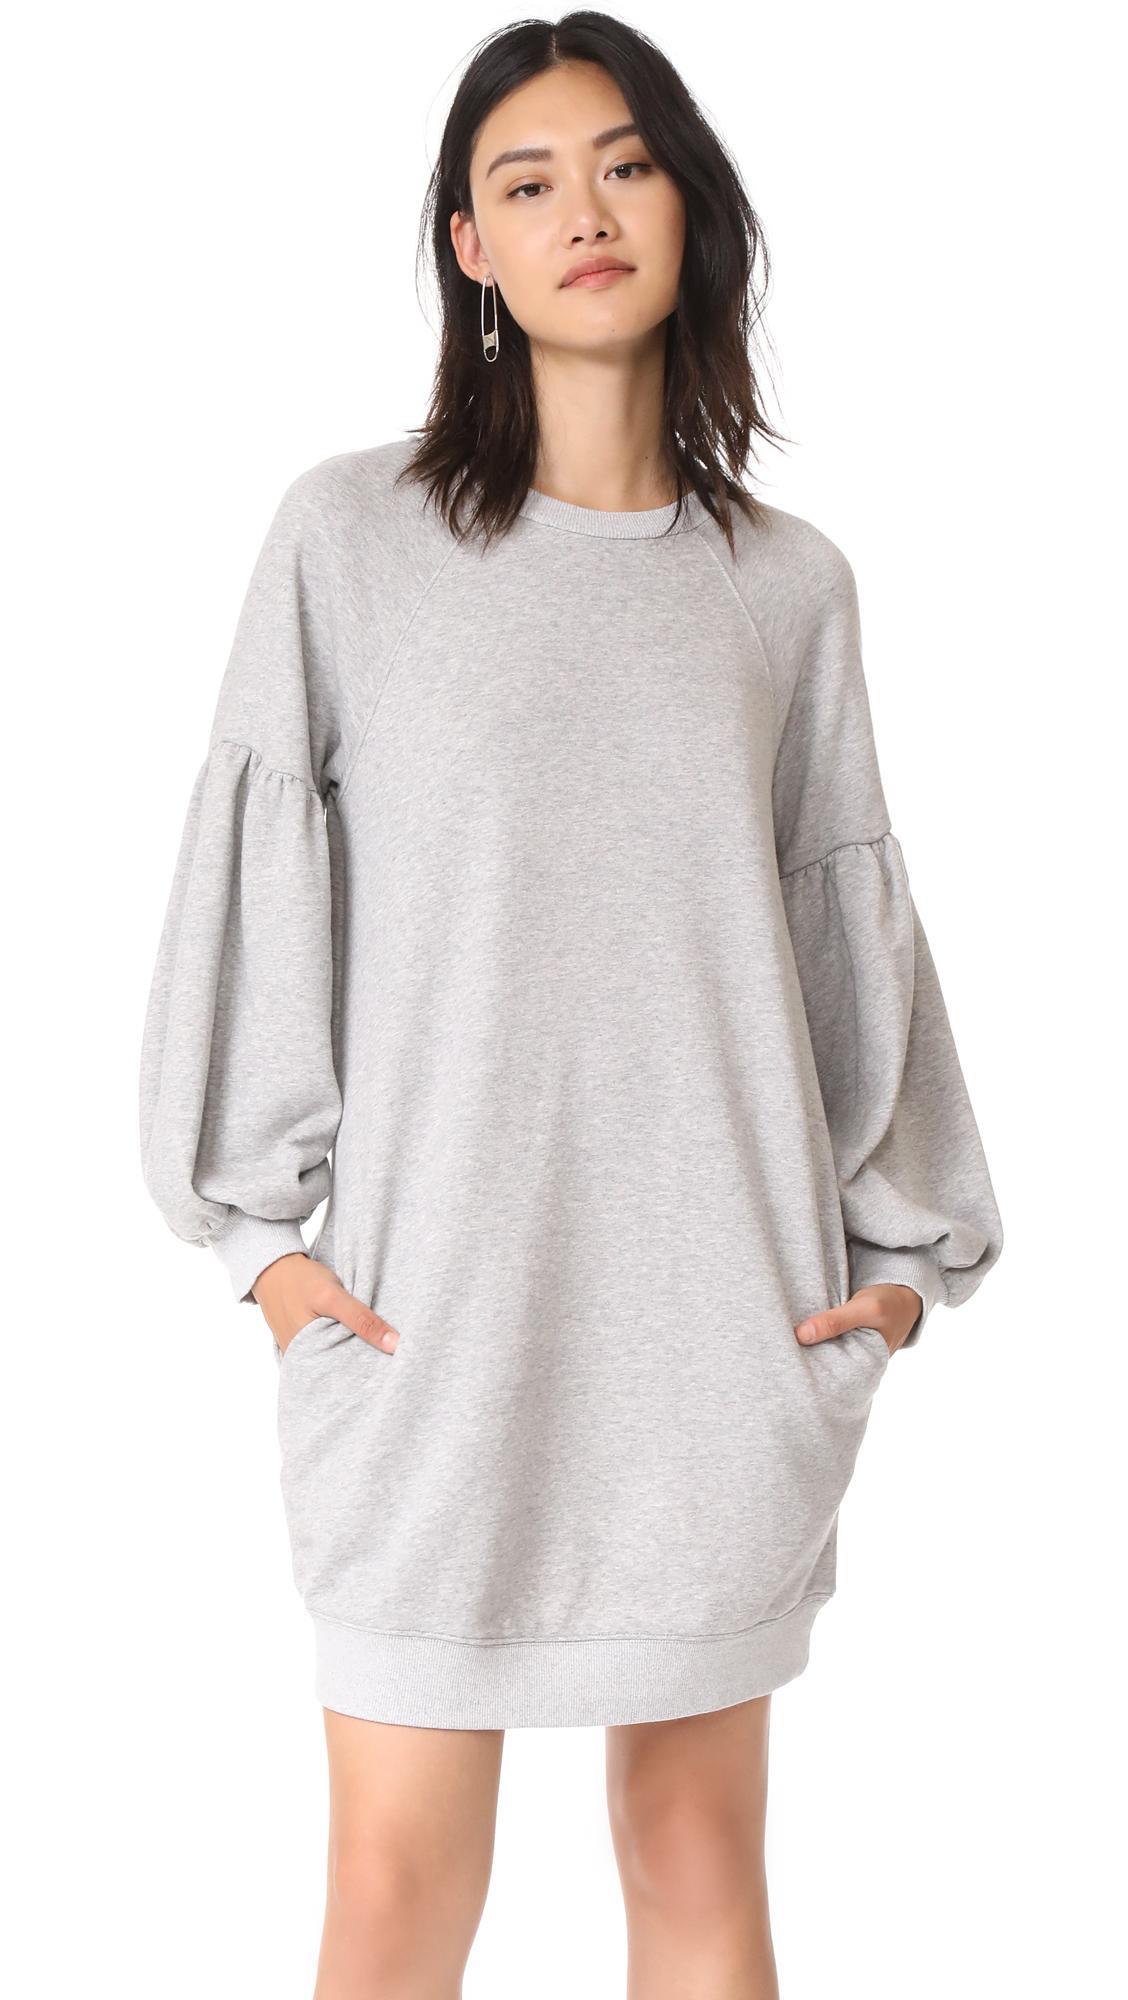 J.o.a. Sweatshirt Dress In Heather Grey